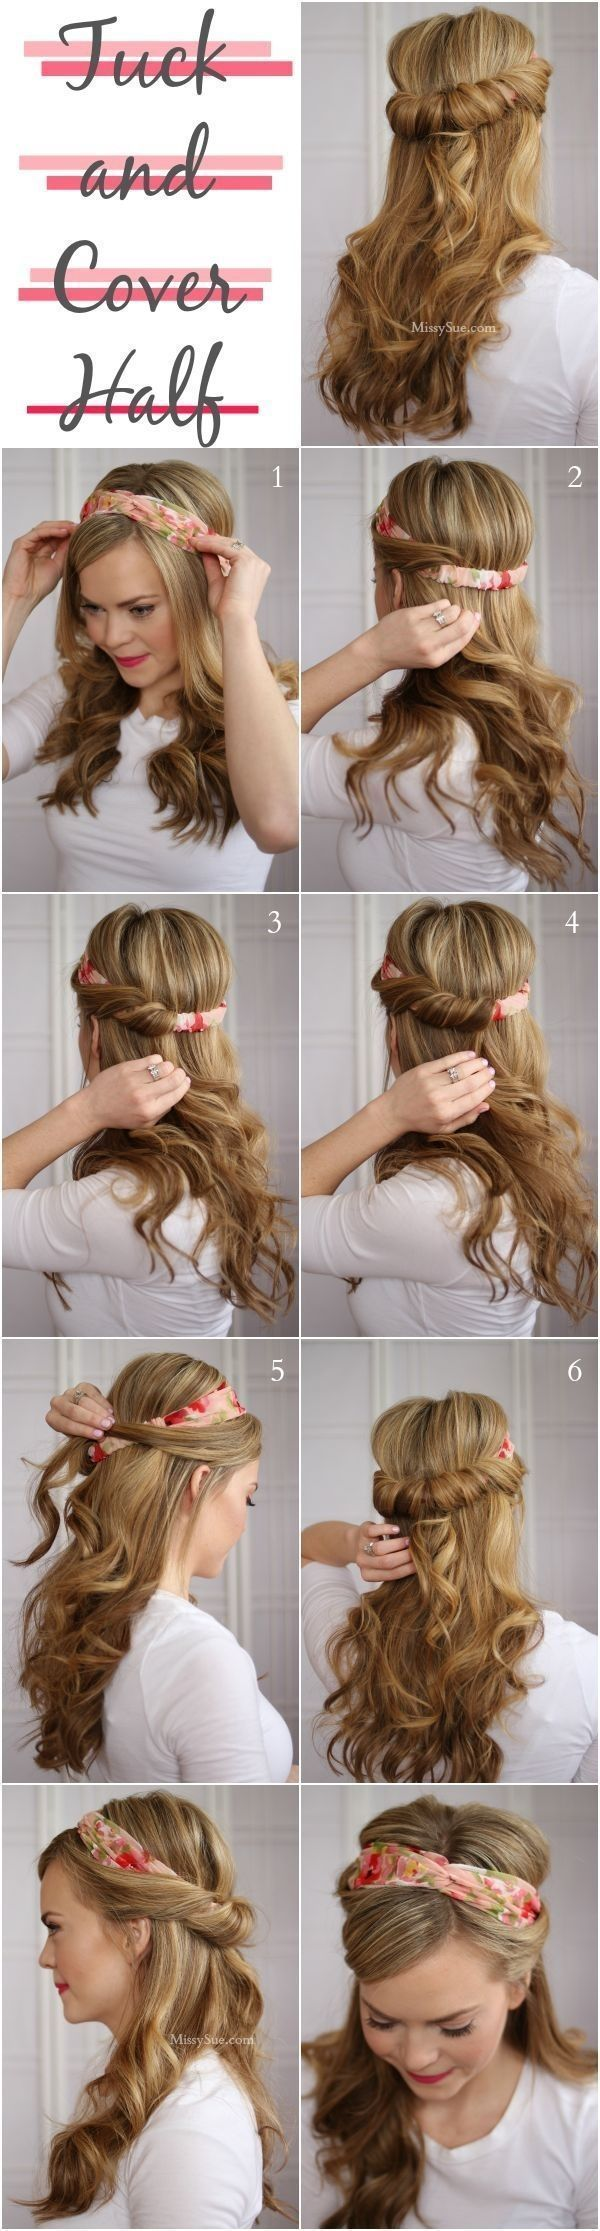 hairstyles for work make up n hair pinterest easy